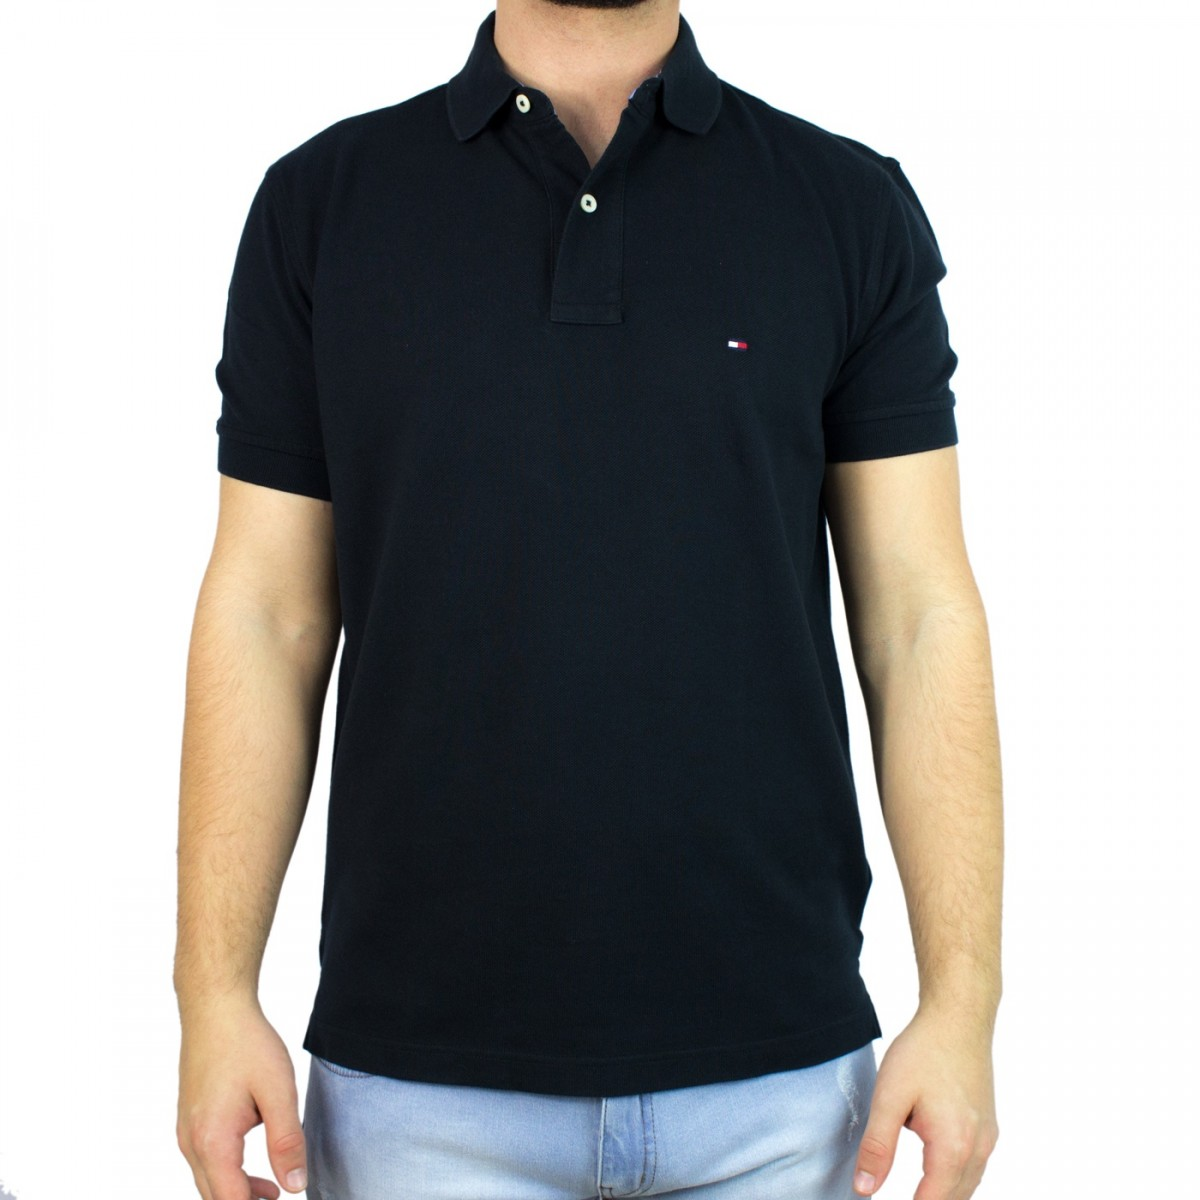 b35df816edcd8 Bizz Store - Camisa Polo Masculina Tommy Hilfiger Preta